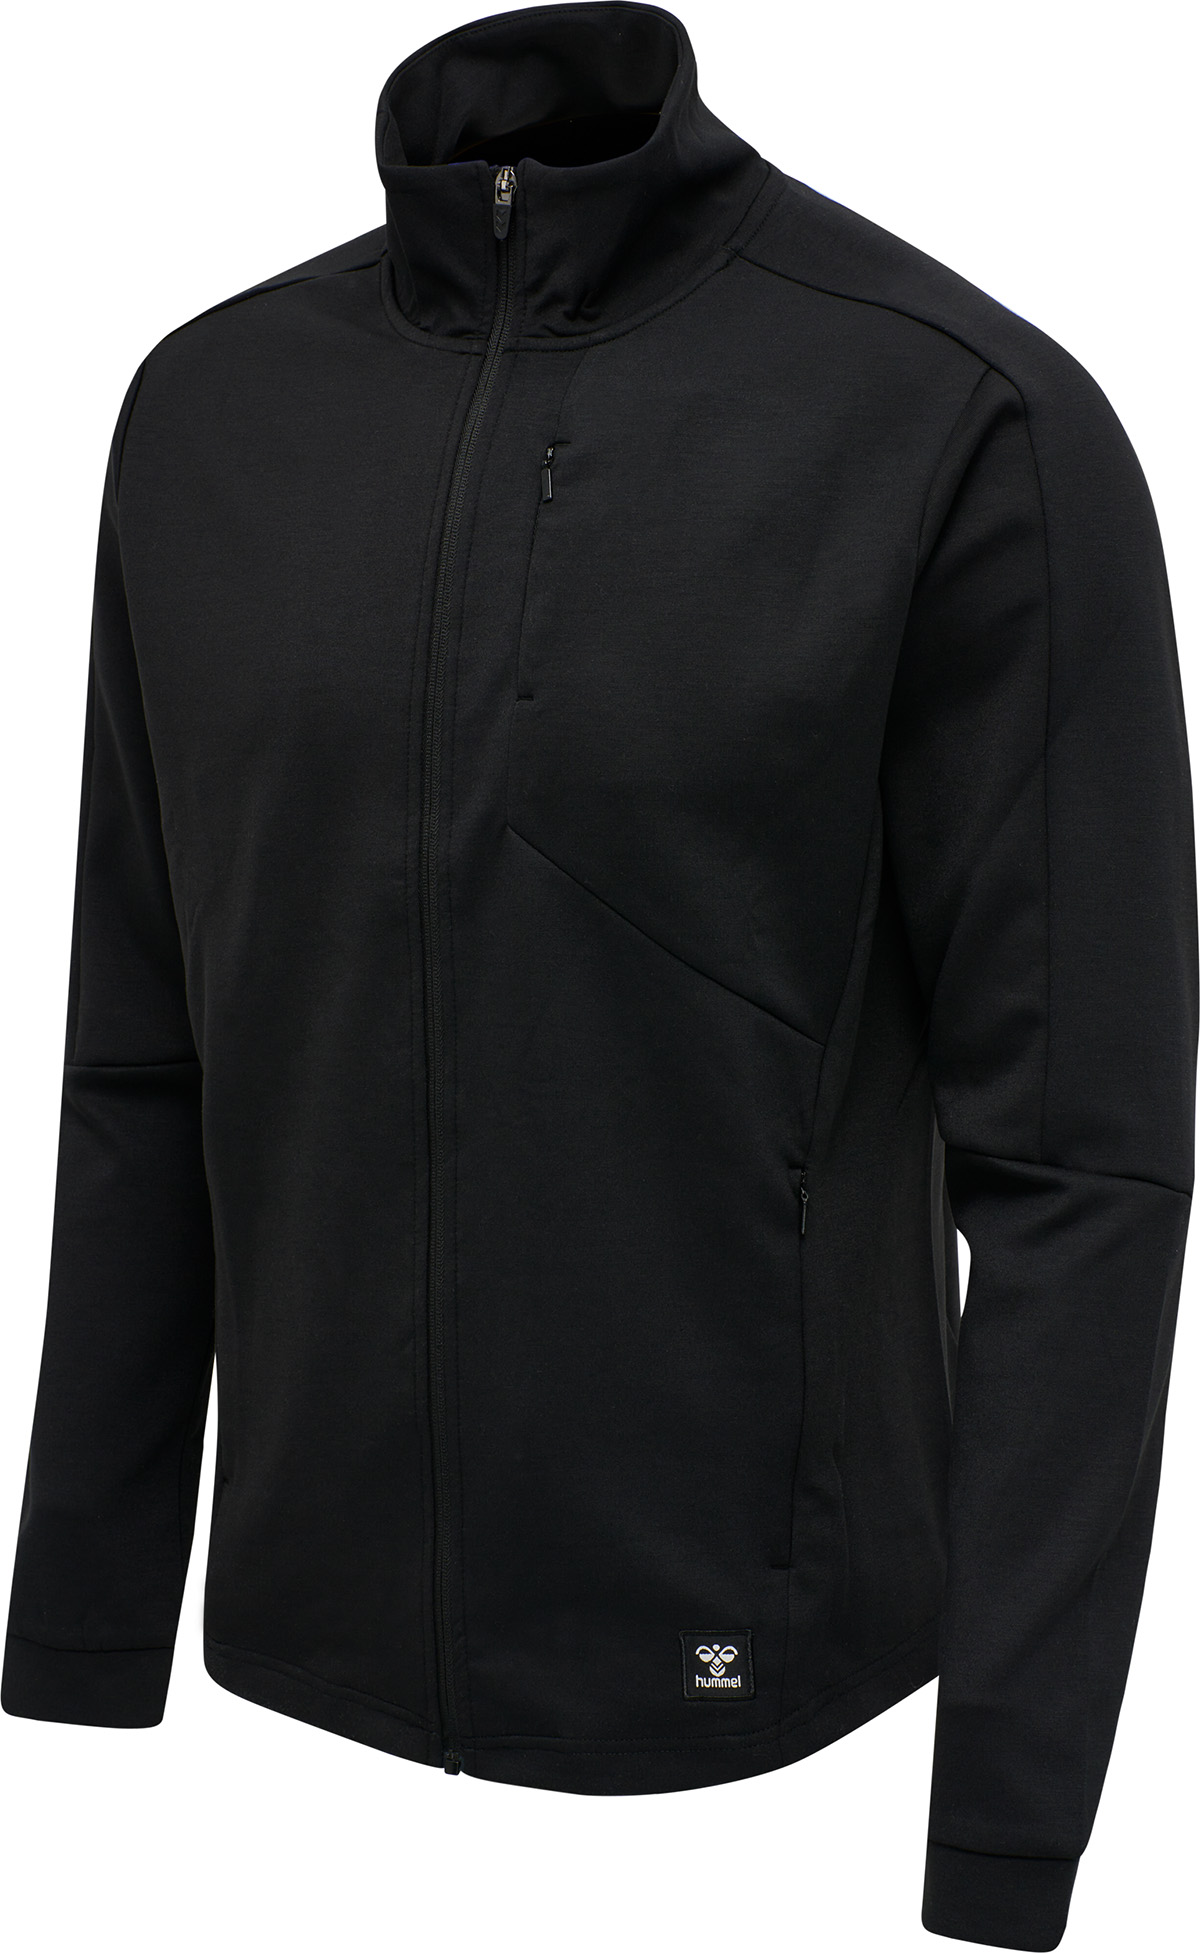 Hummel Tropper zip jacket